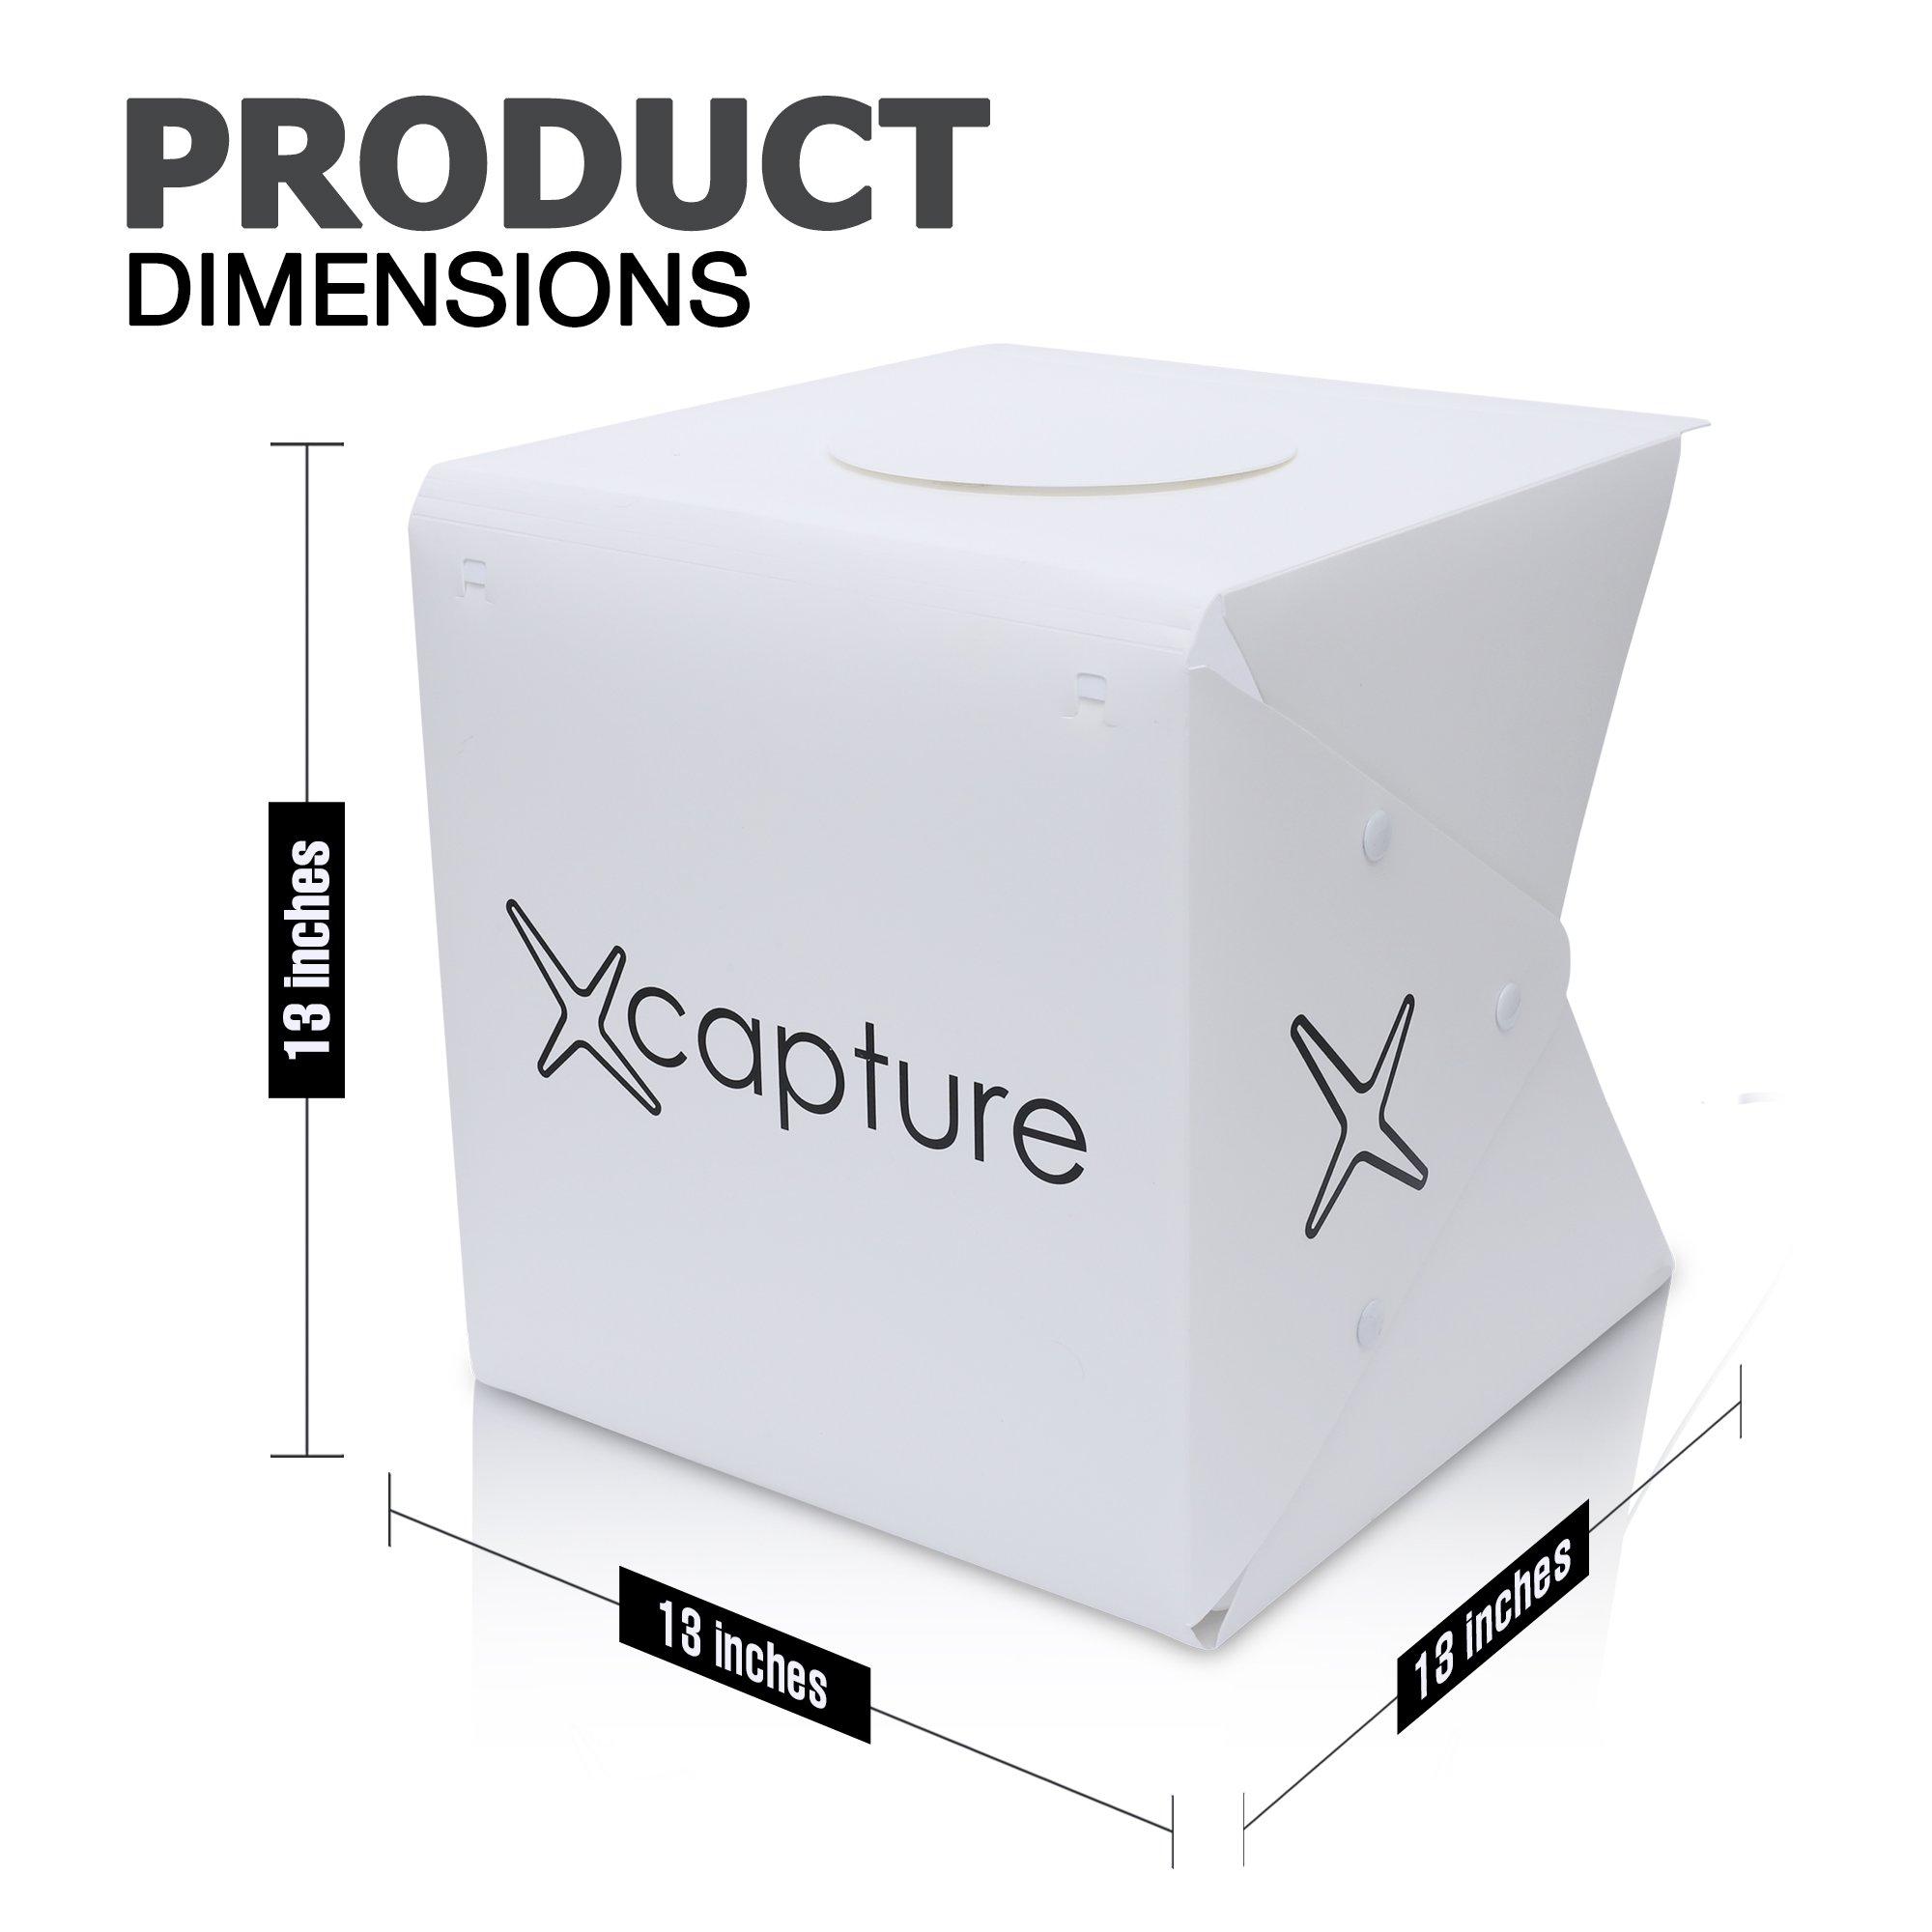 Capture Portable Photo Studio Box: LED Light Box Photo Tent- Large by Capture (Image #4)